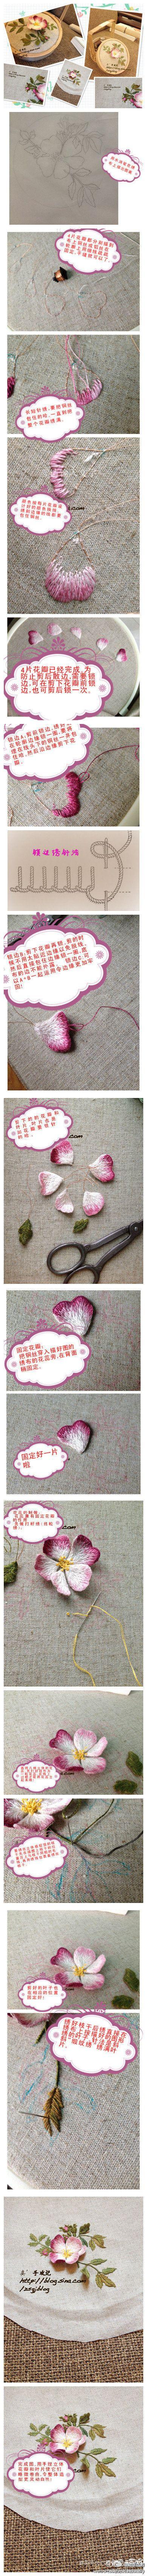 TMD,看着真是心动无比啊。蔷薇!立体绣的教…_来自雪忆六月的图片分享-堆糖网